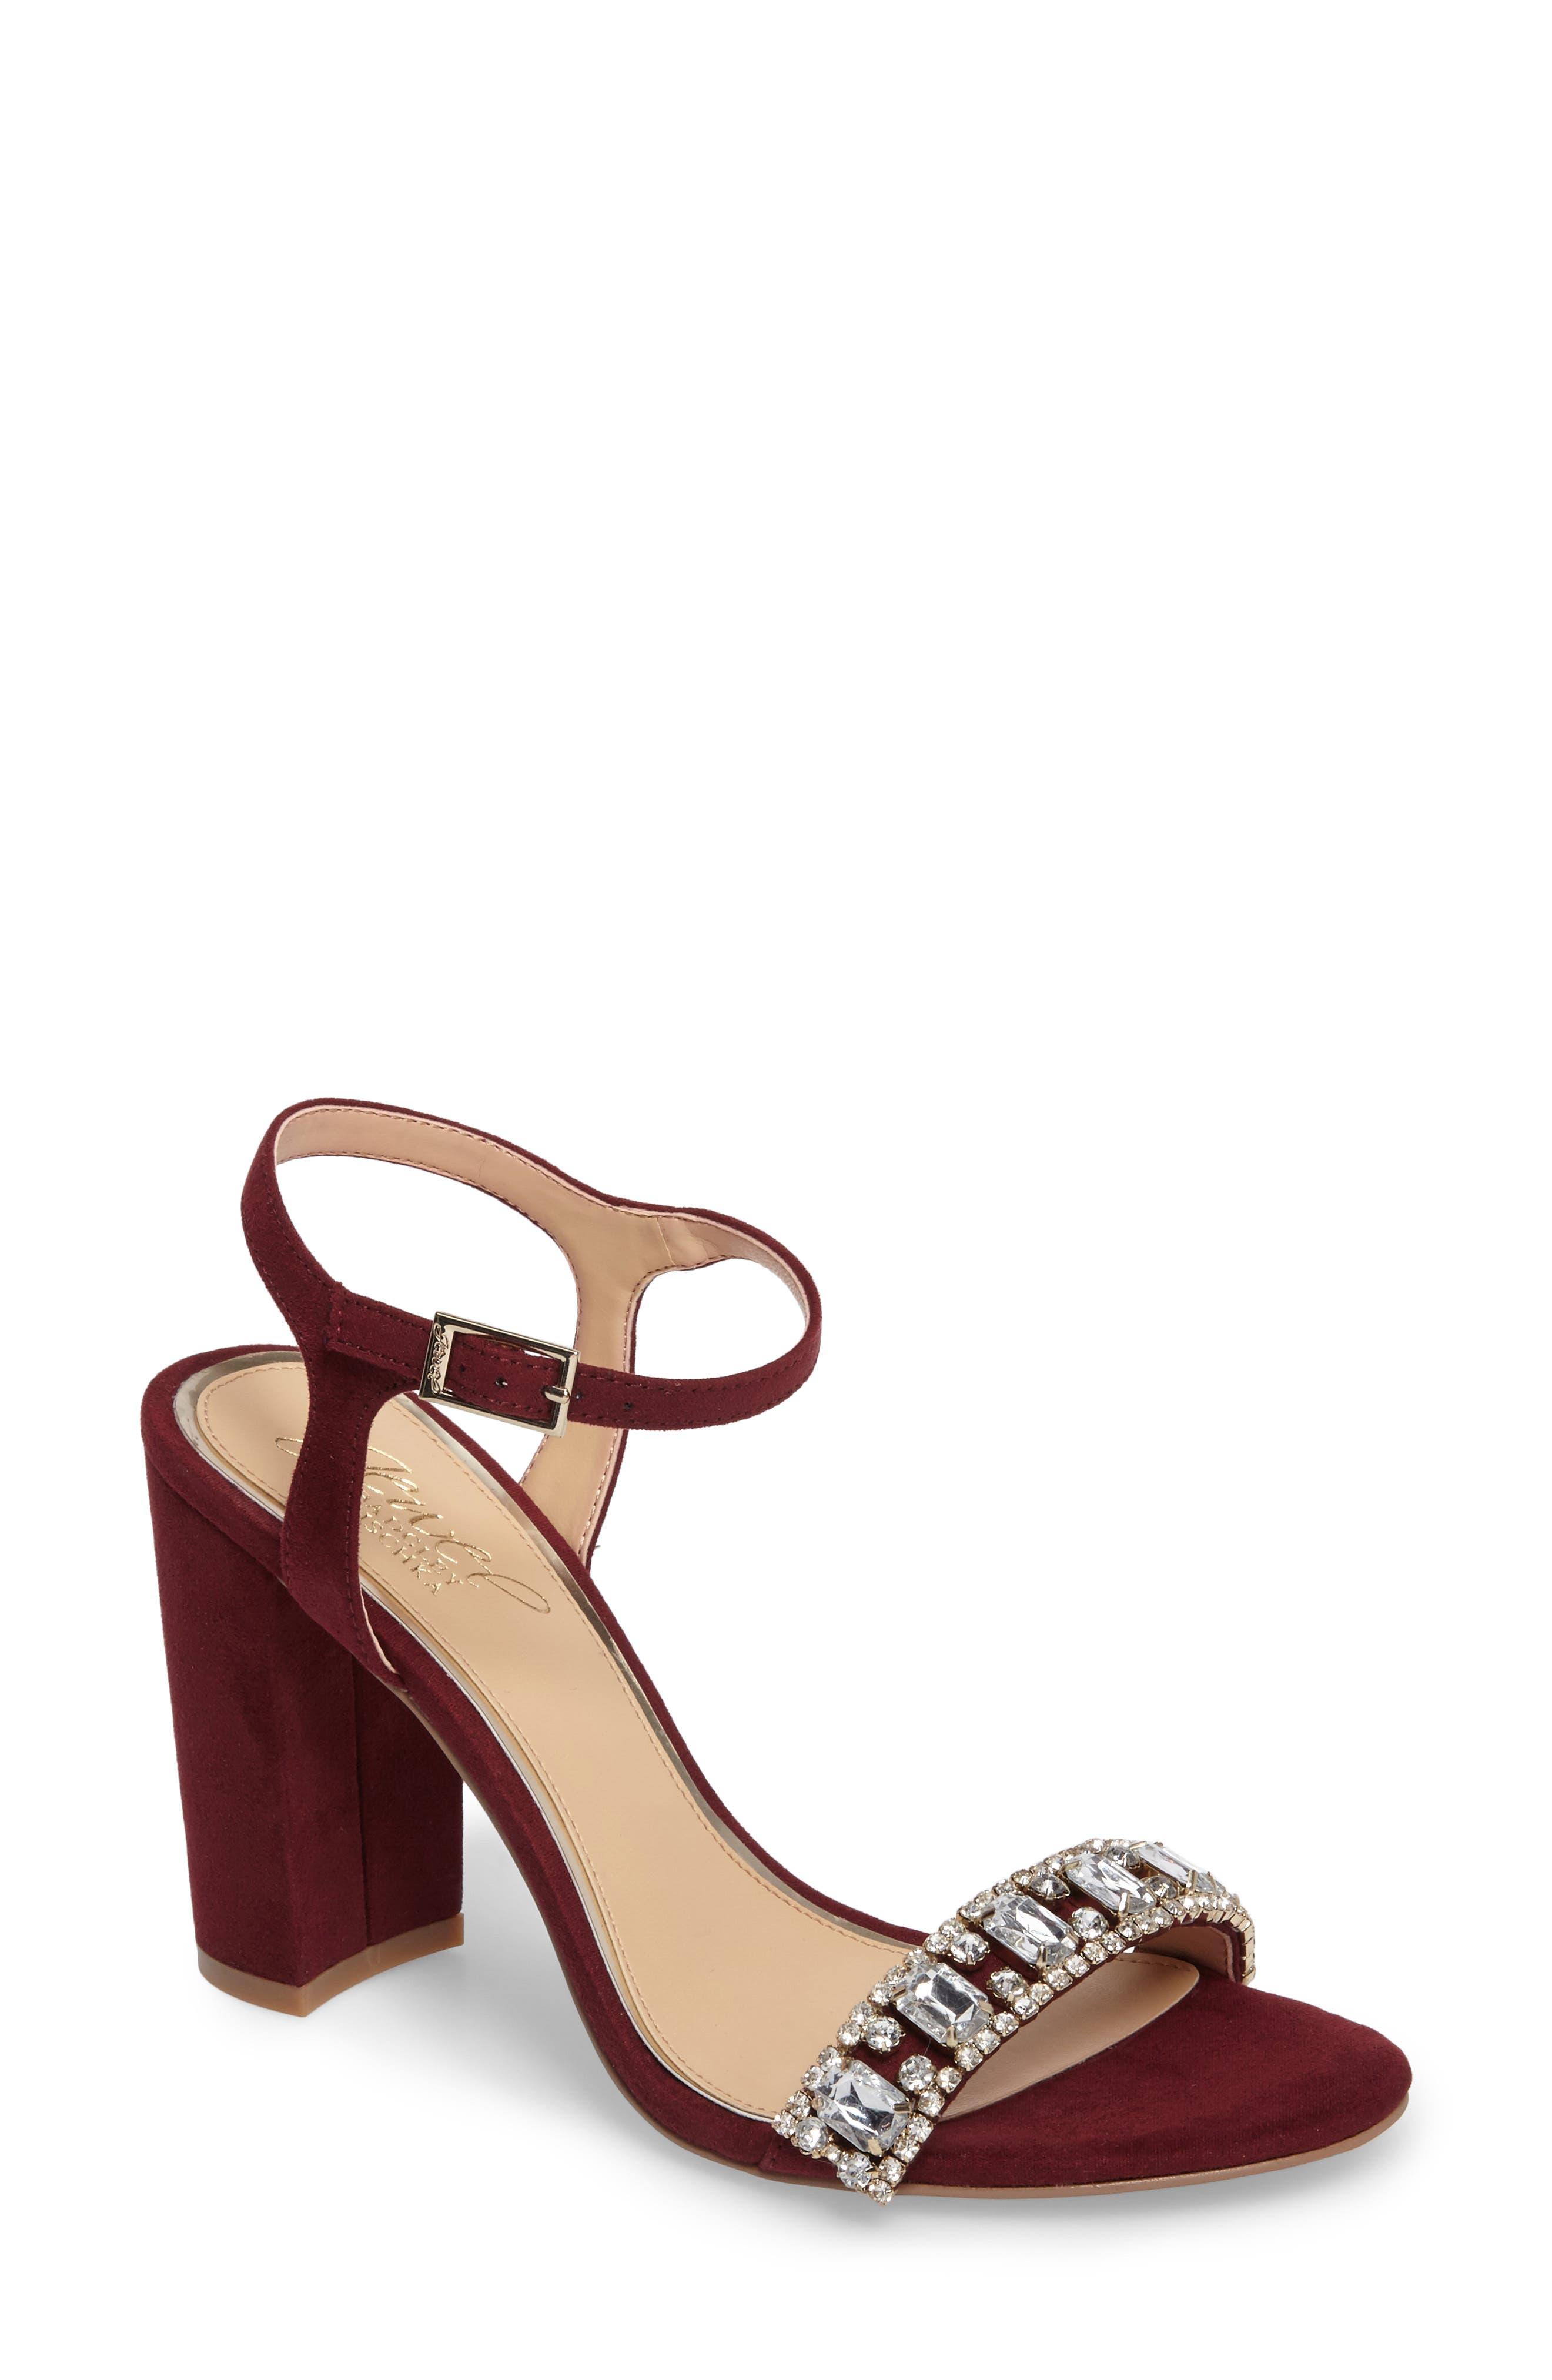 Hendricks Embellished Block Heel Sandal,                             Main thumbnail 2, color,